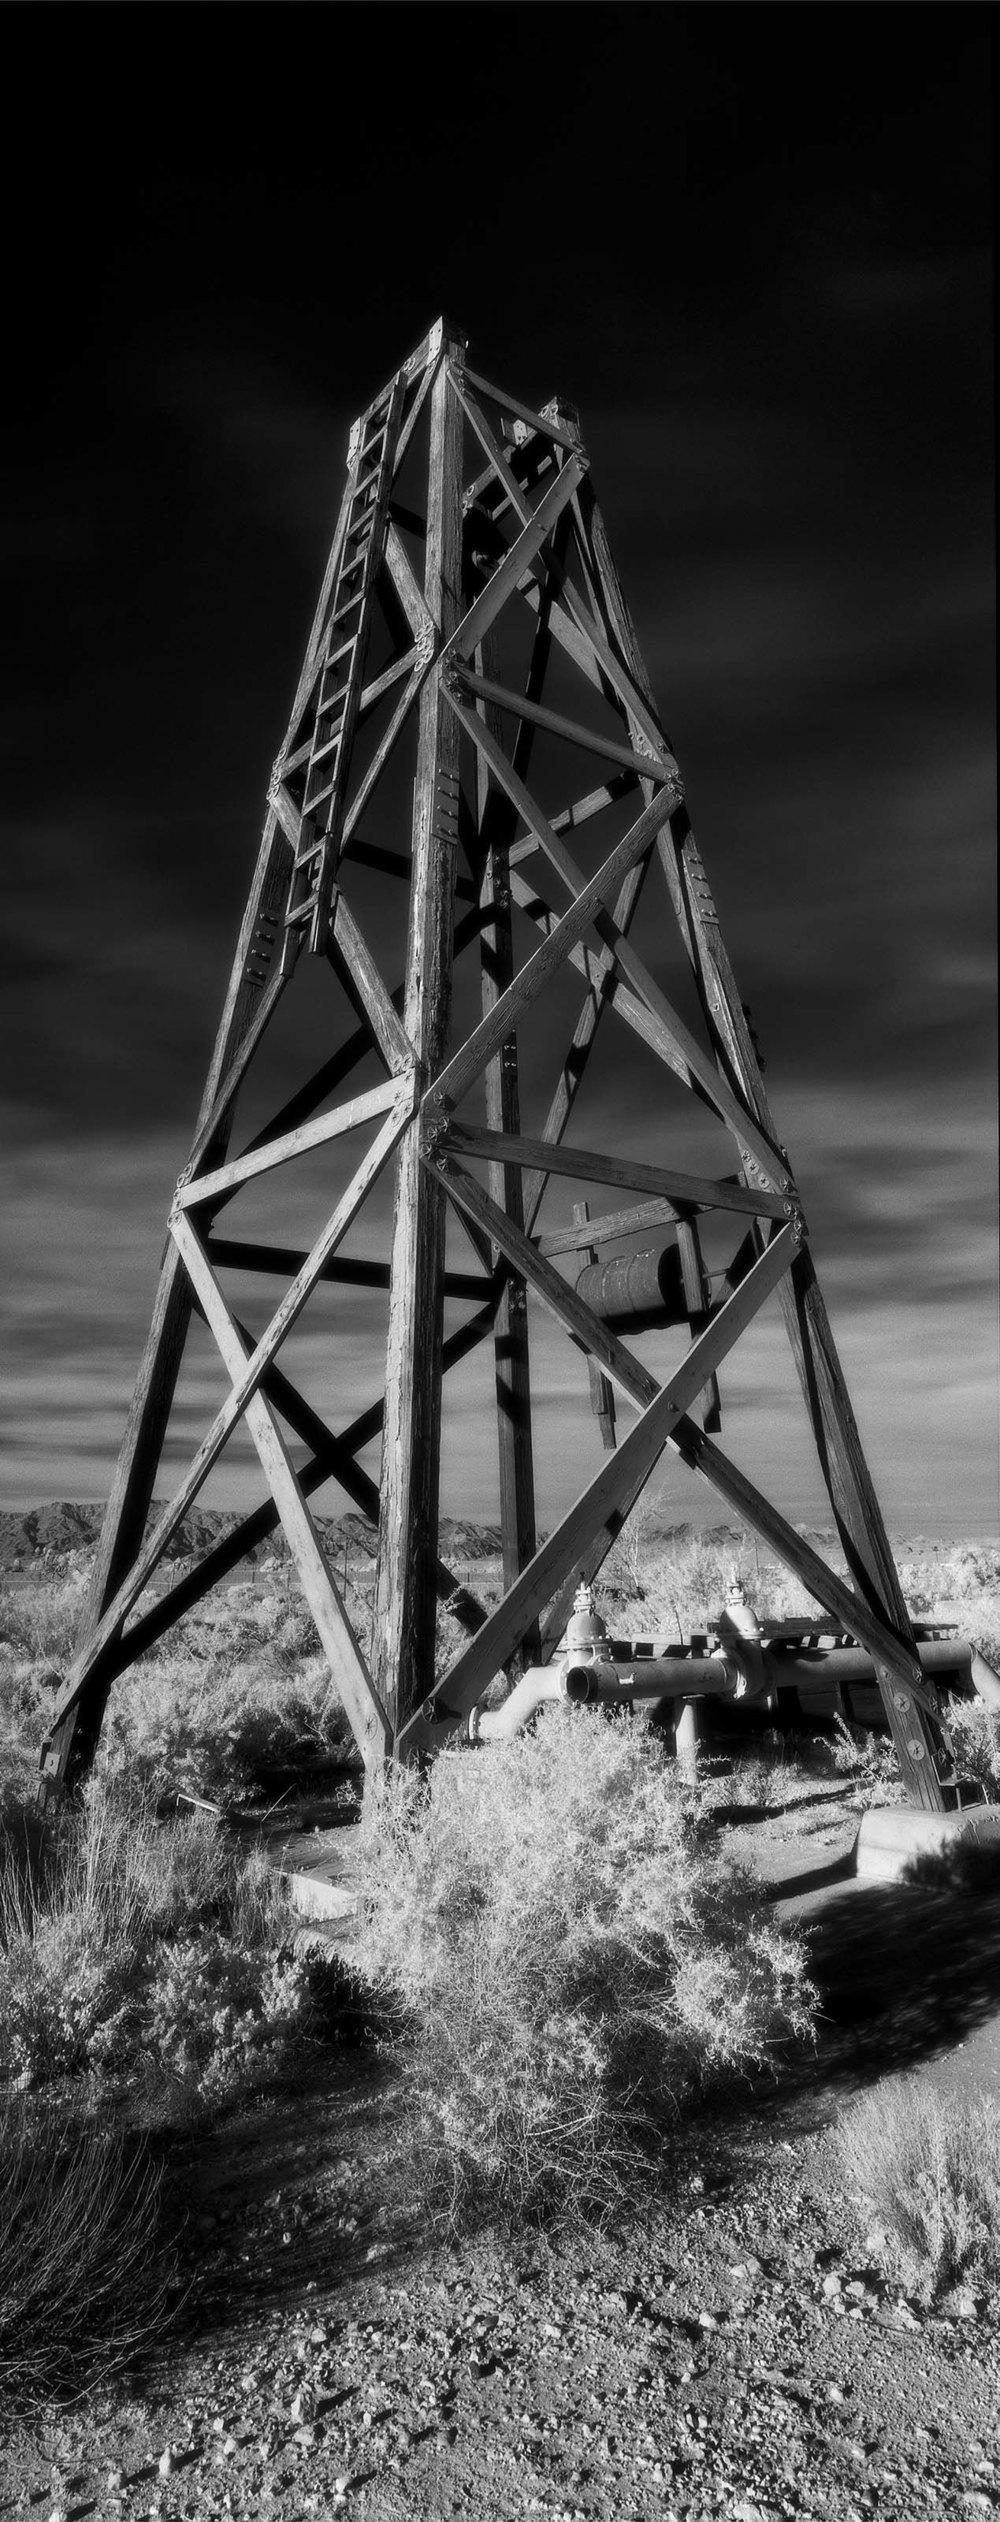 Derrick- Springs Preserve, NV